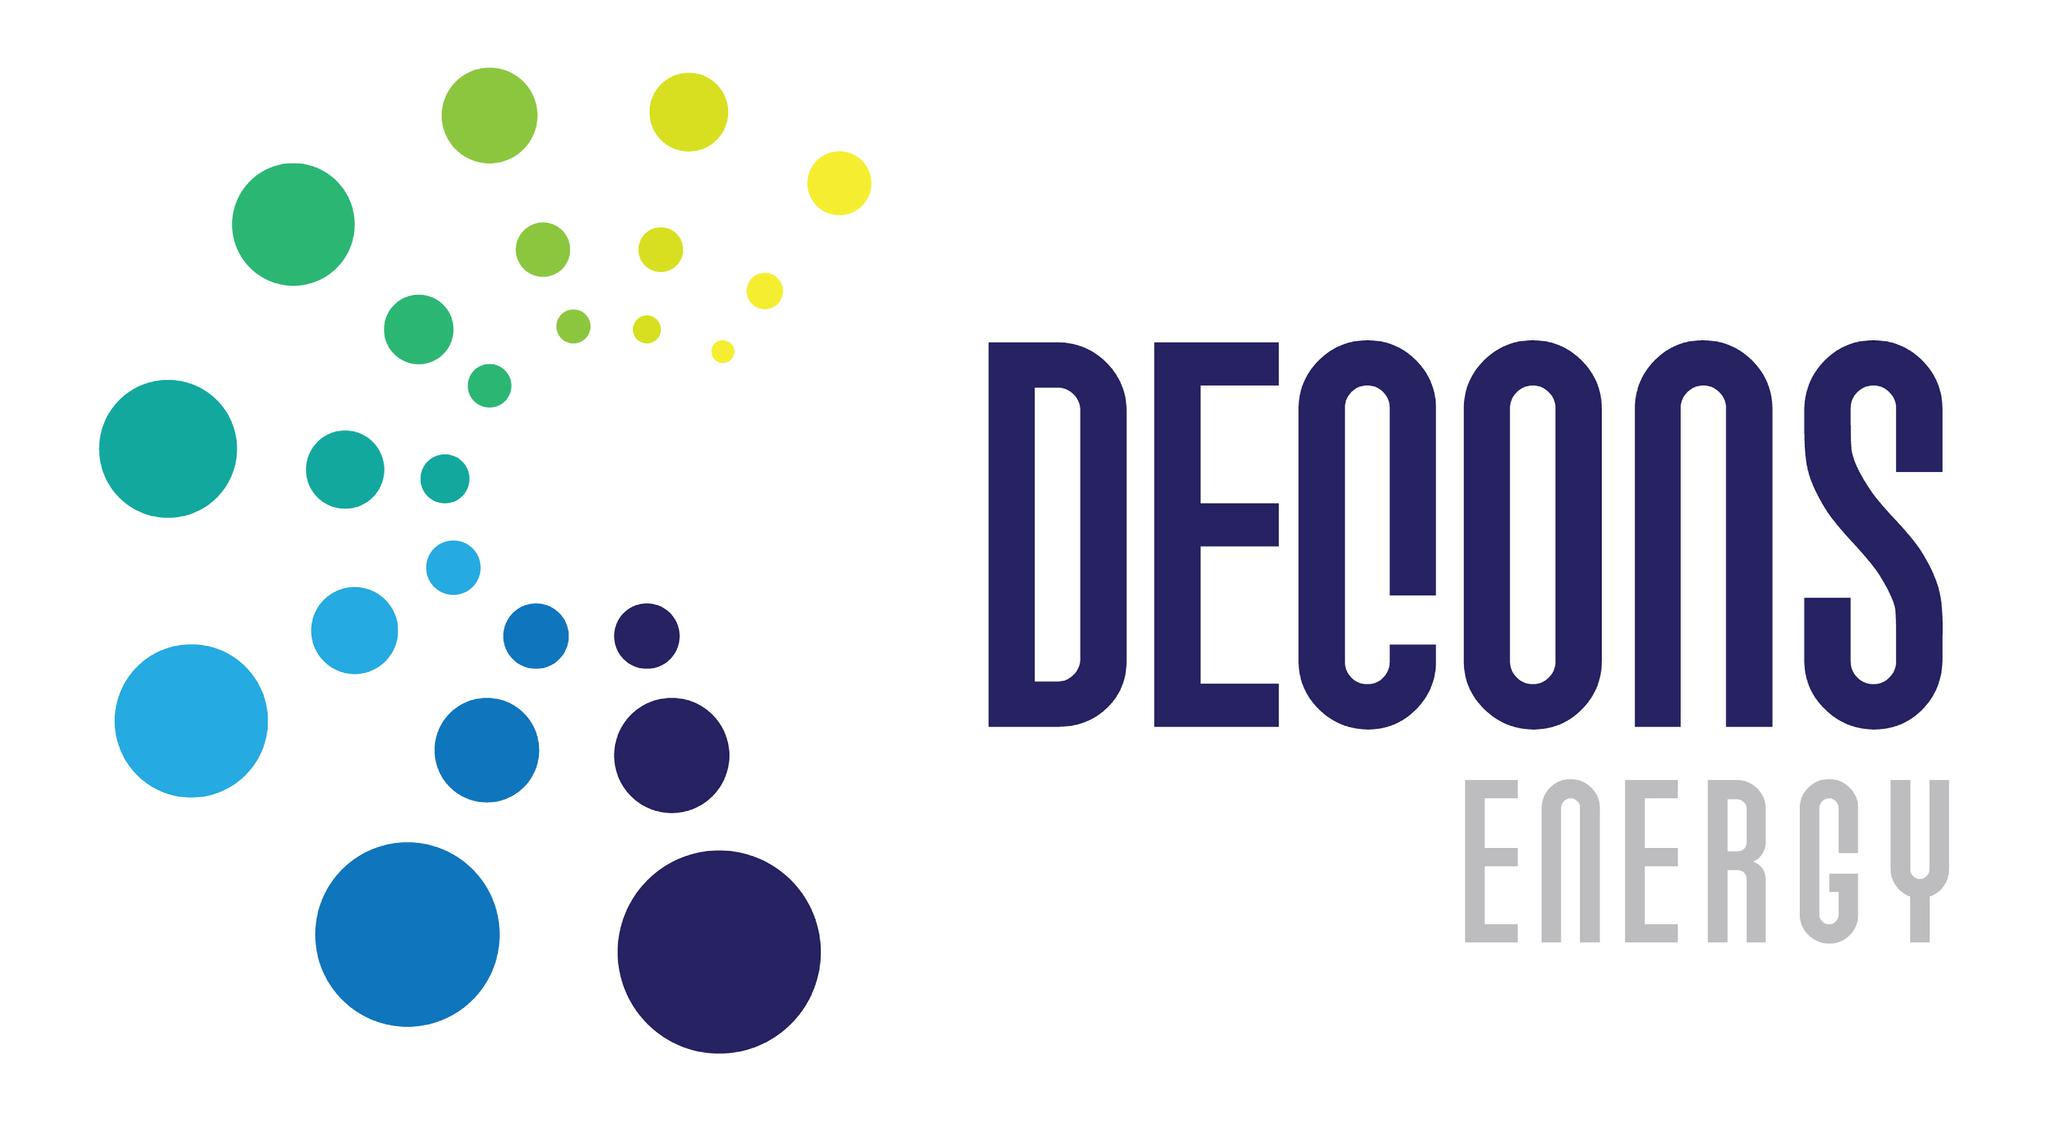 DECONS ENERGY, LLC